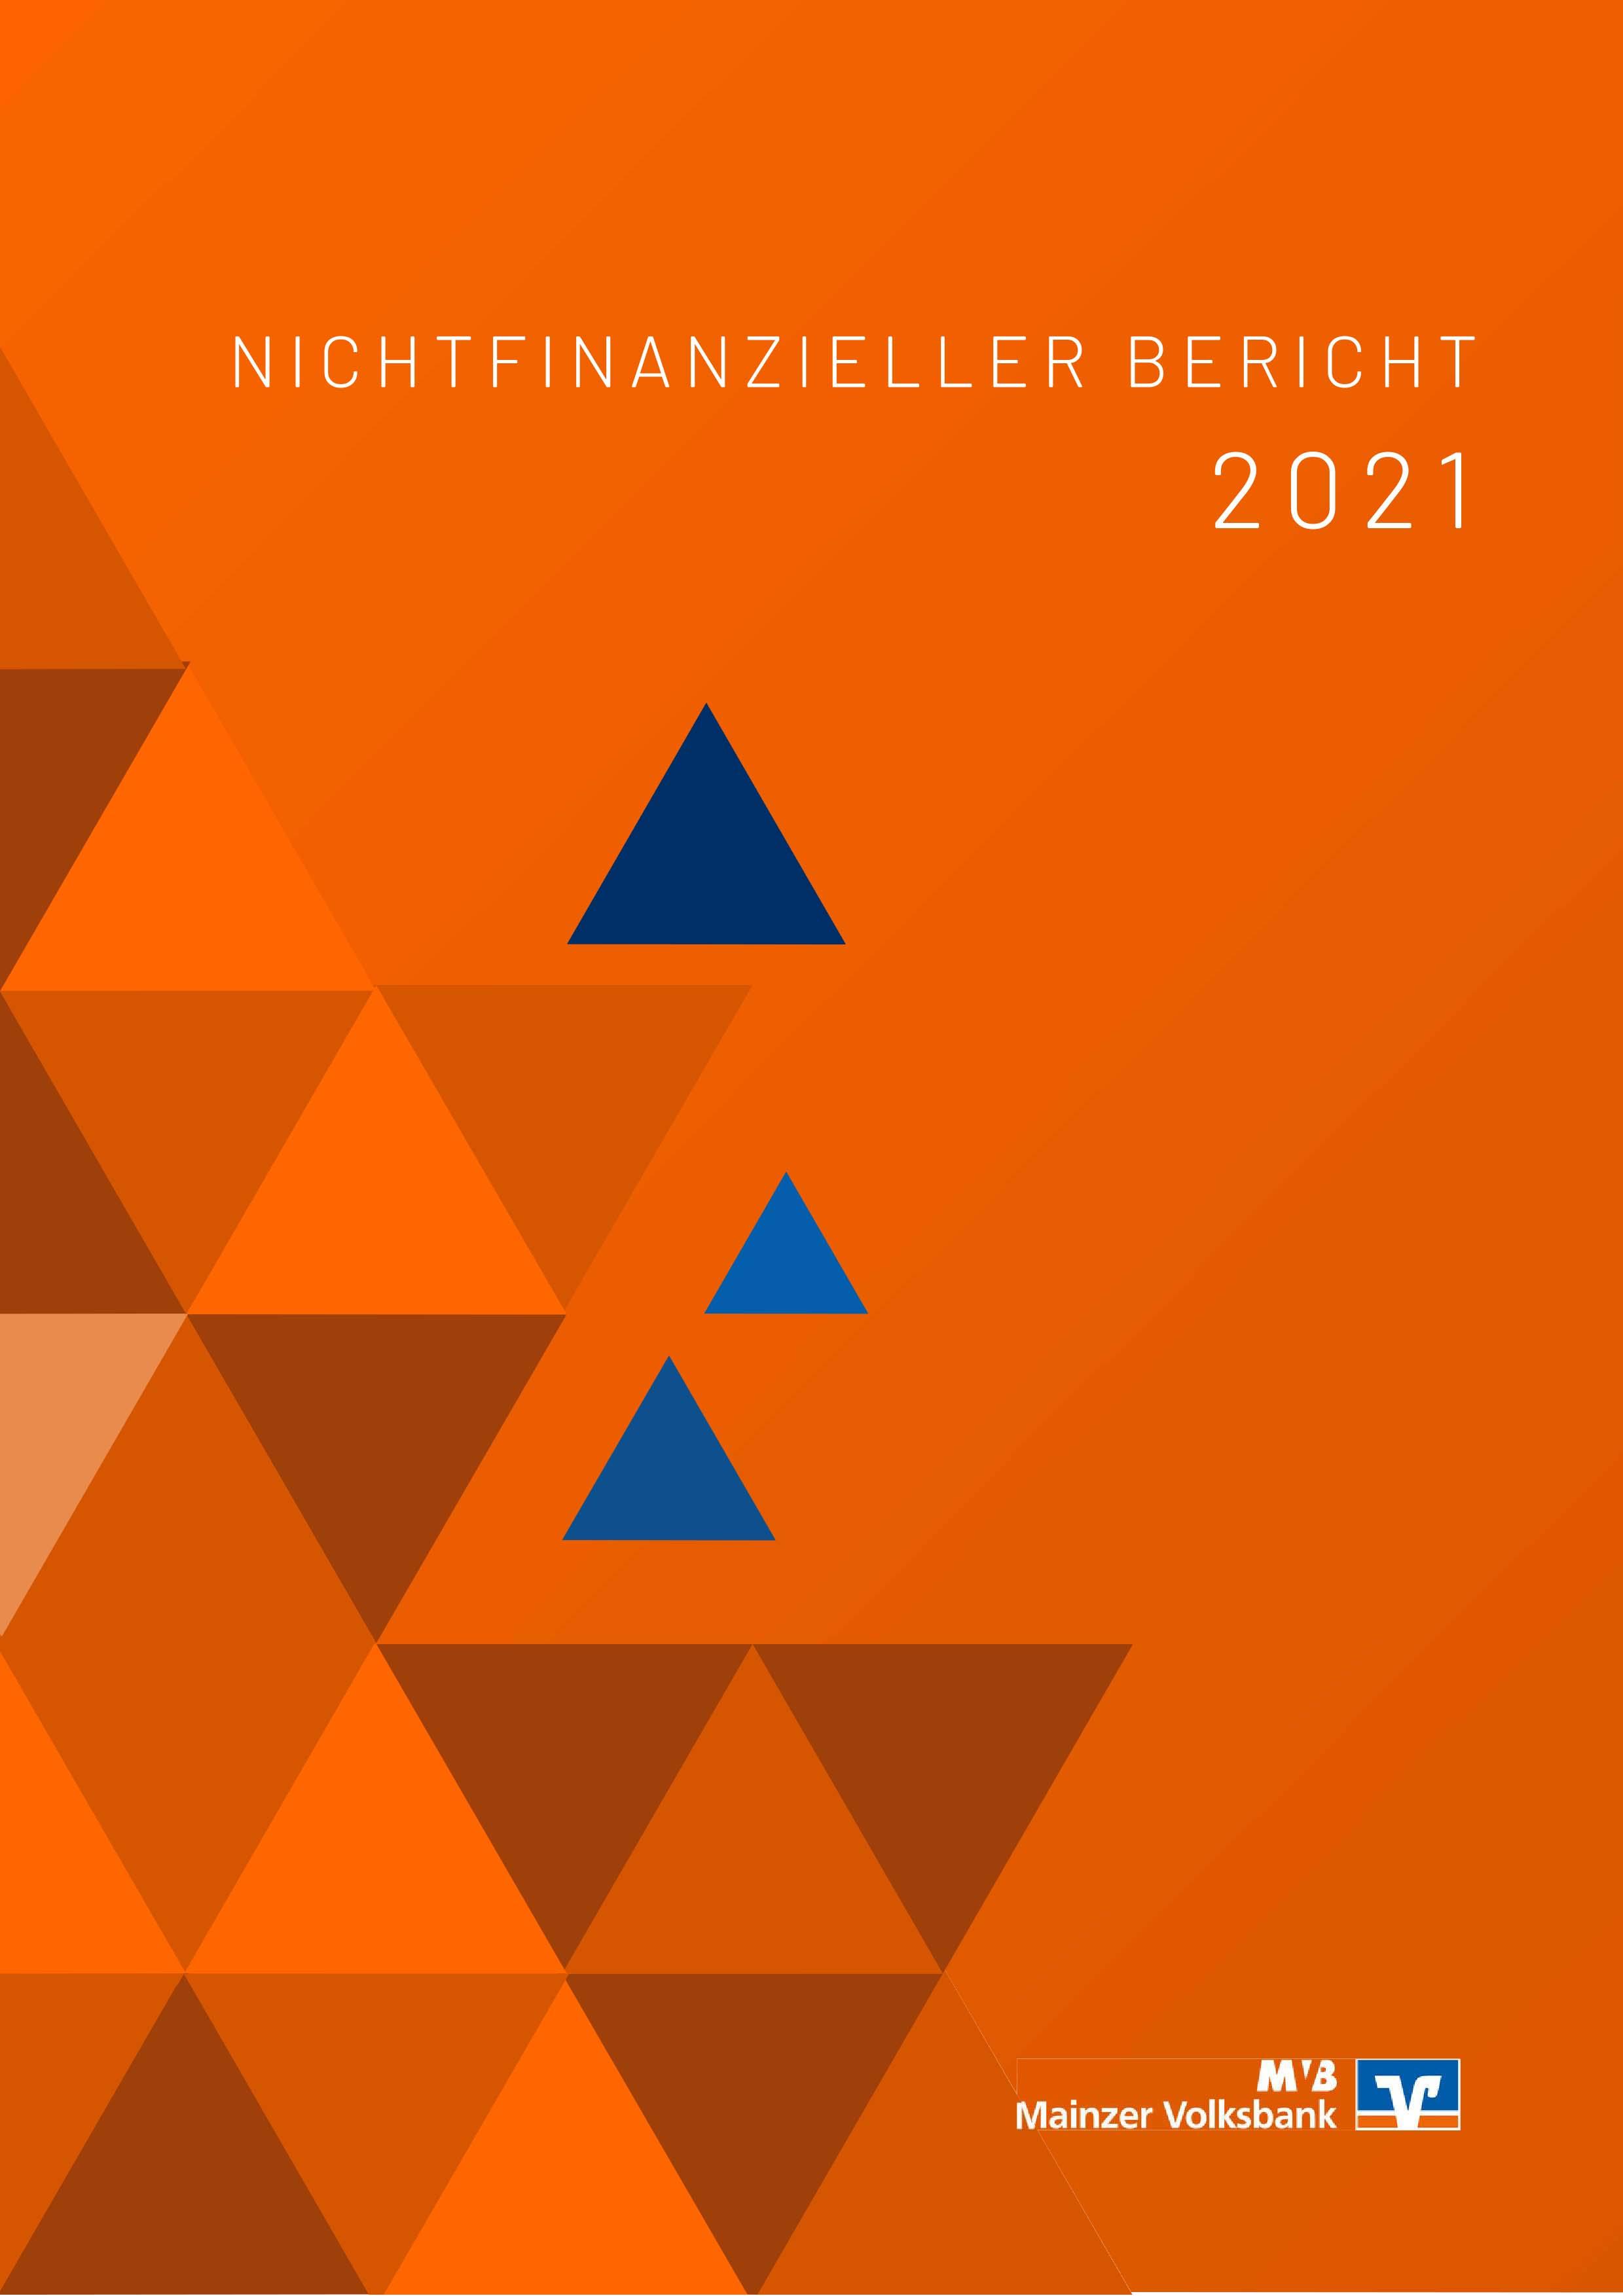 Nichtfinanzieller Bericht MVB 2018